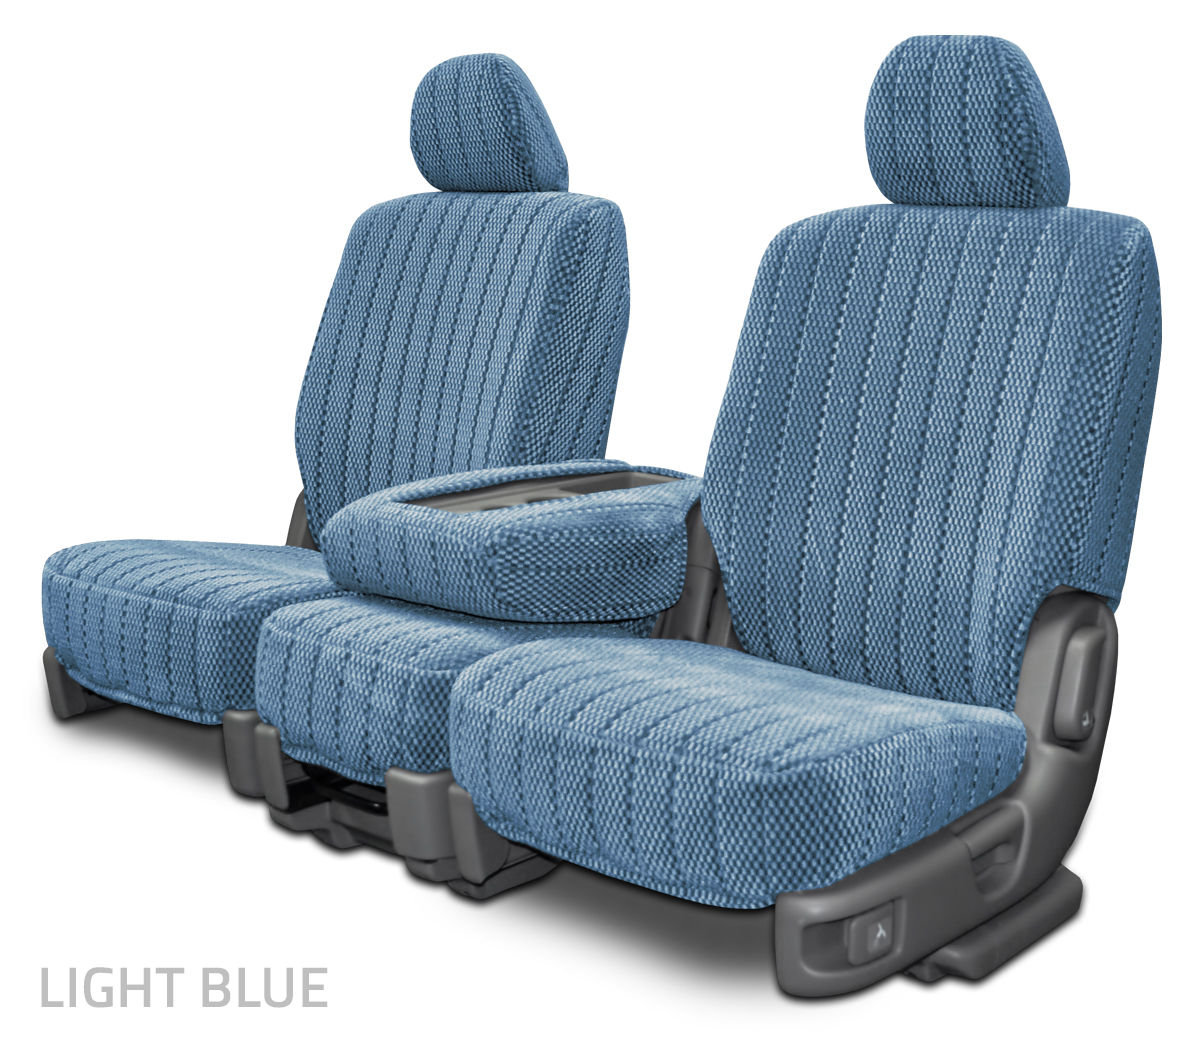 Tremendous Scottsdale Seat Covers Ibusinesslaw Wood Chair Design Ideas Ibusinesslaworg